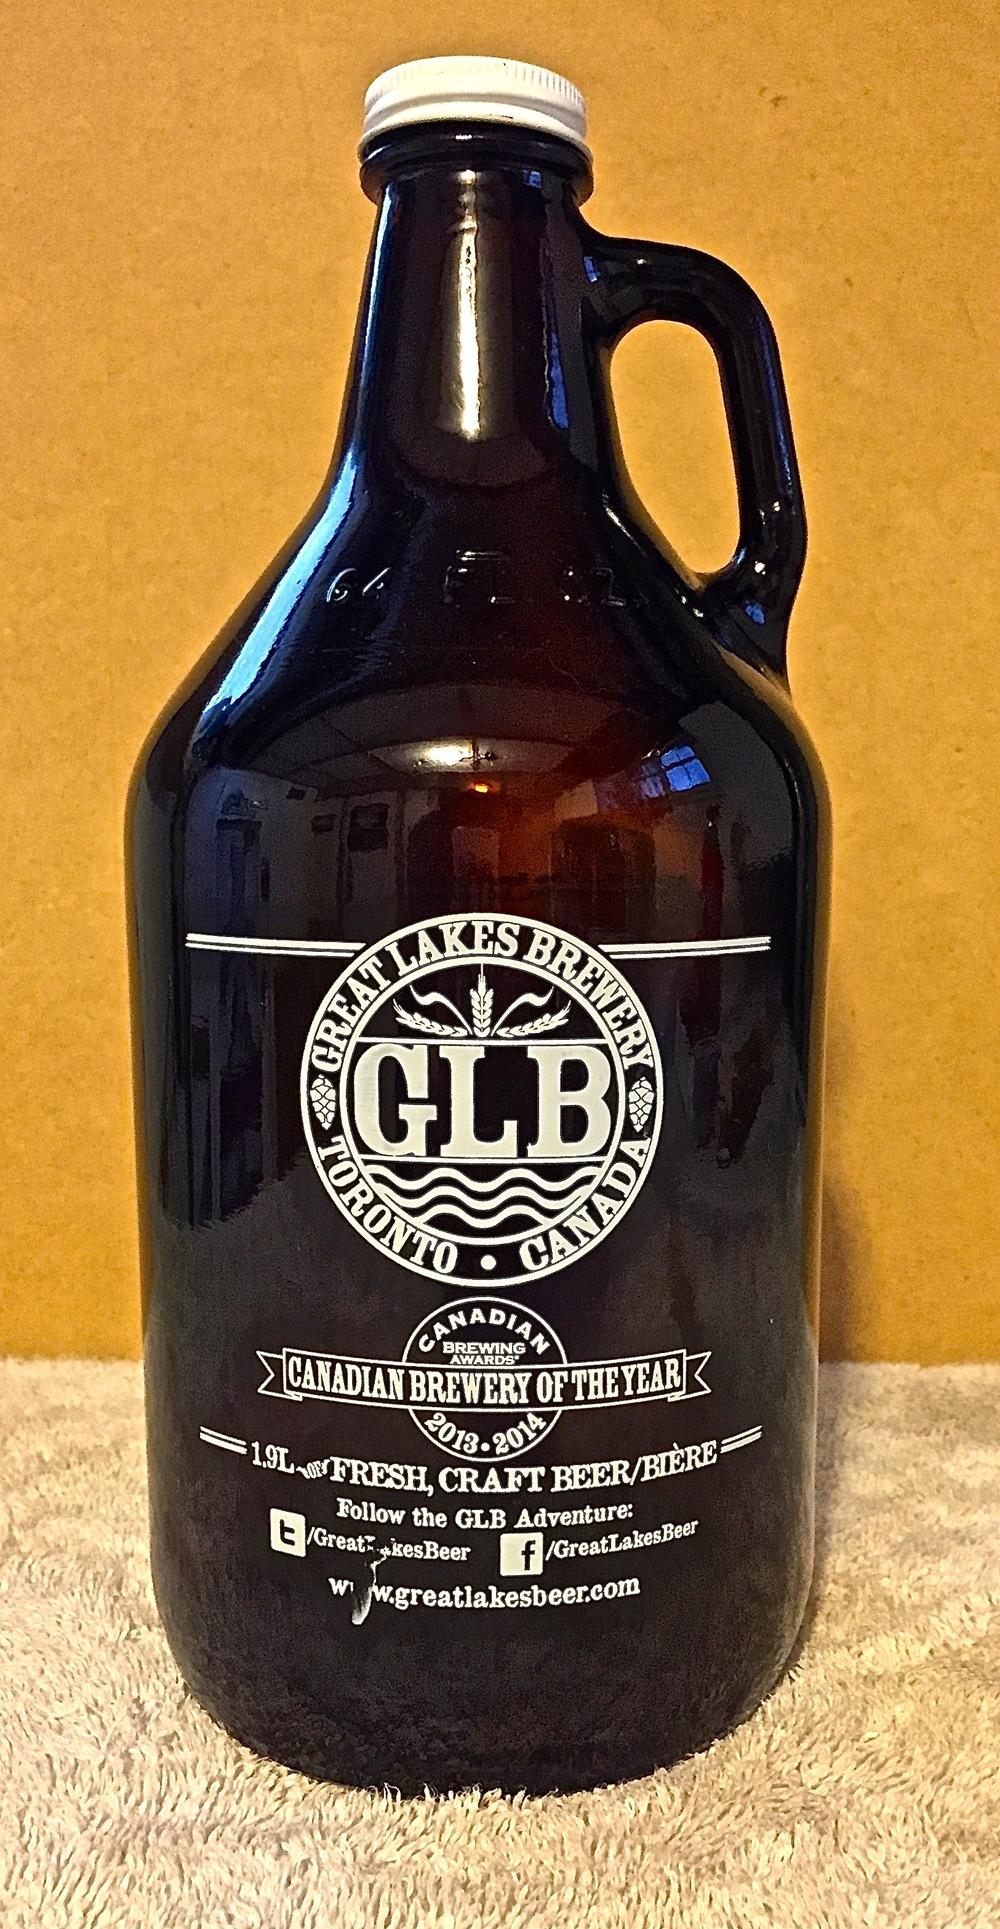 GR - Great Lakes Brewery 2 (ON).jpg